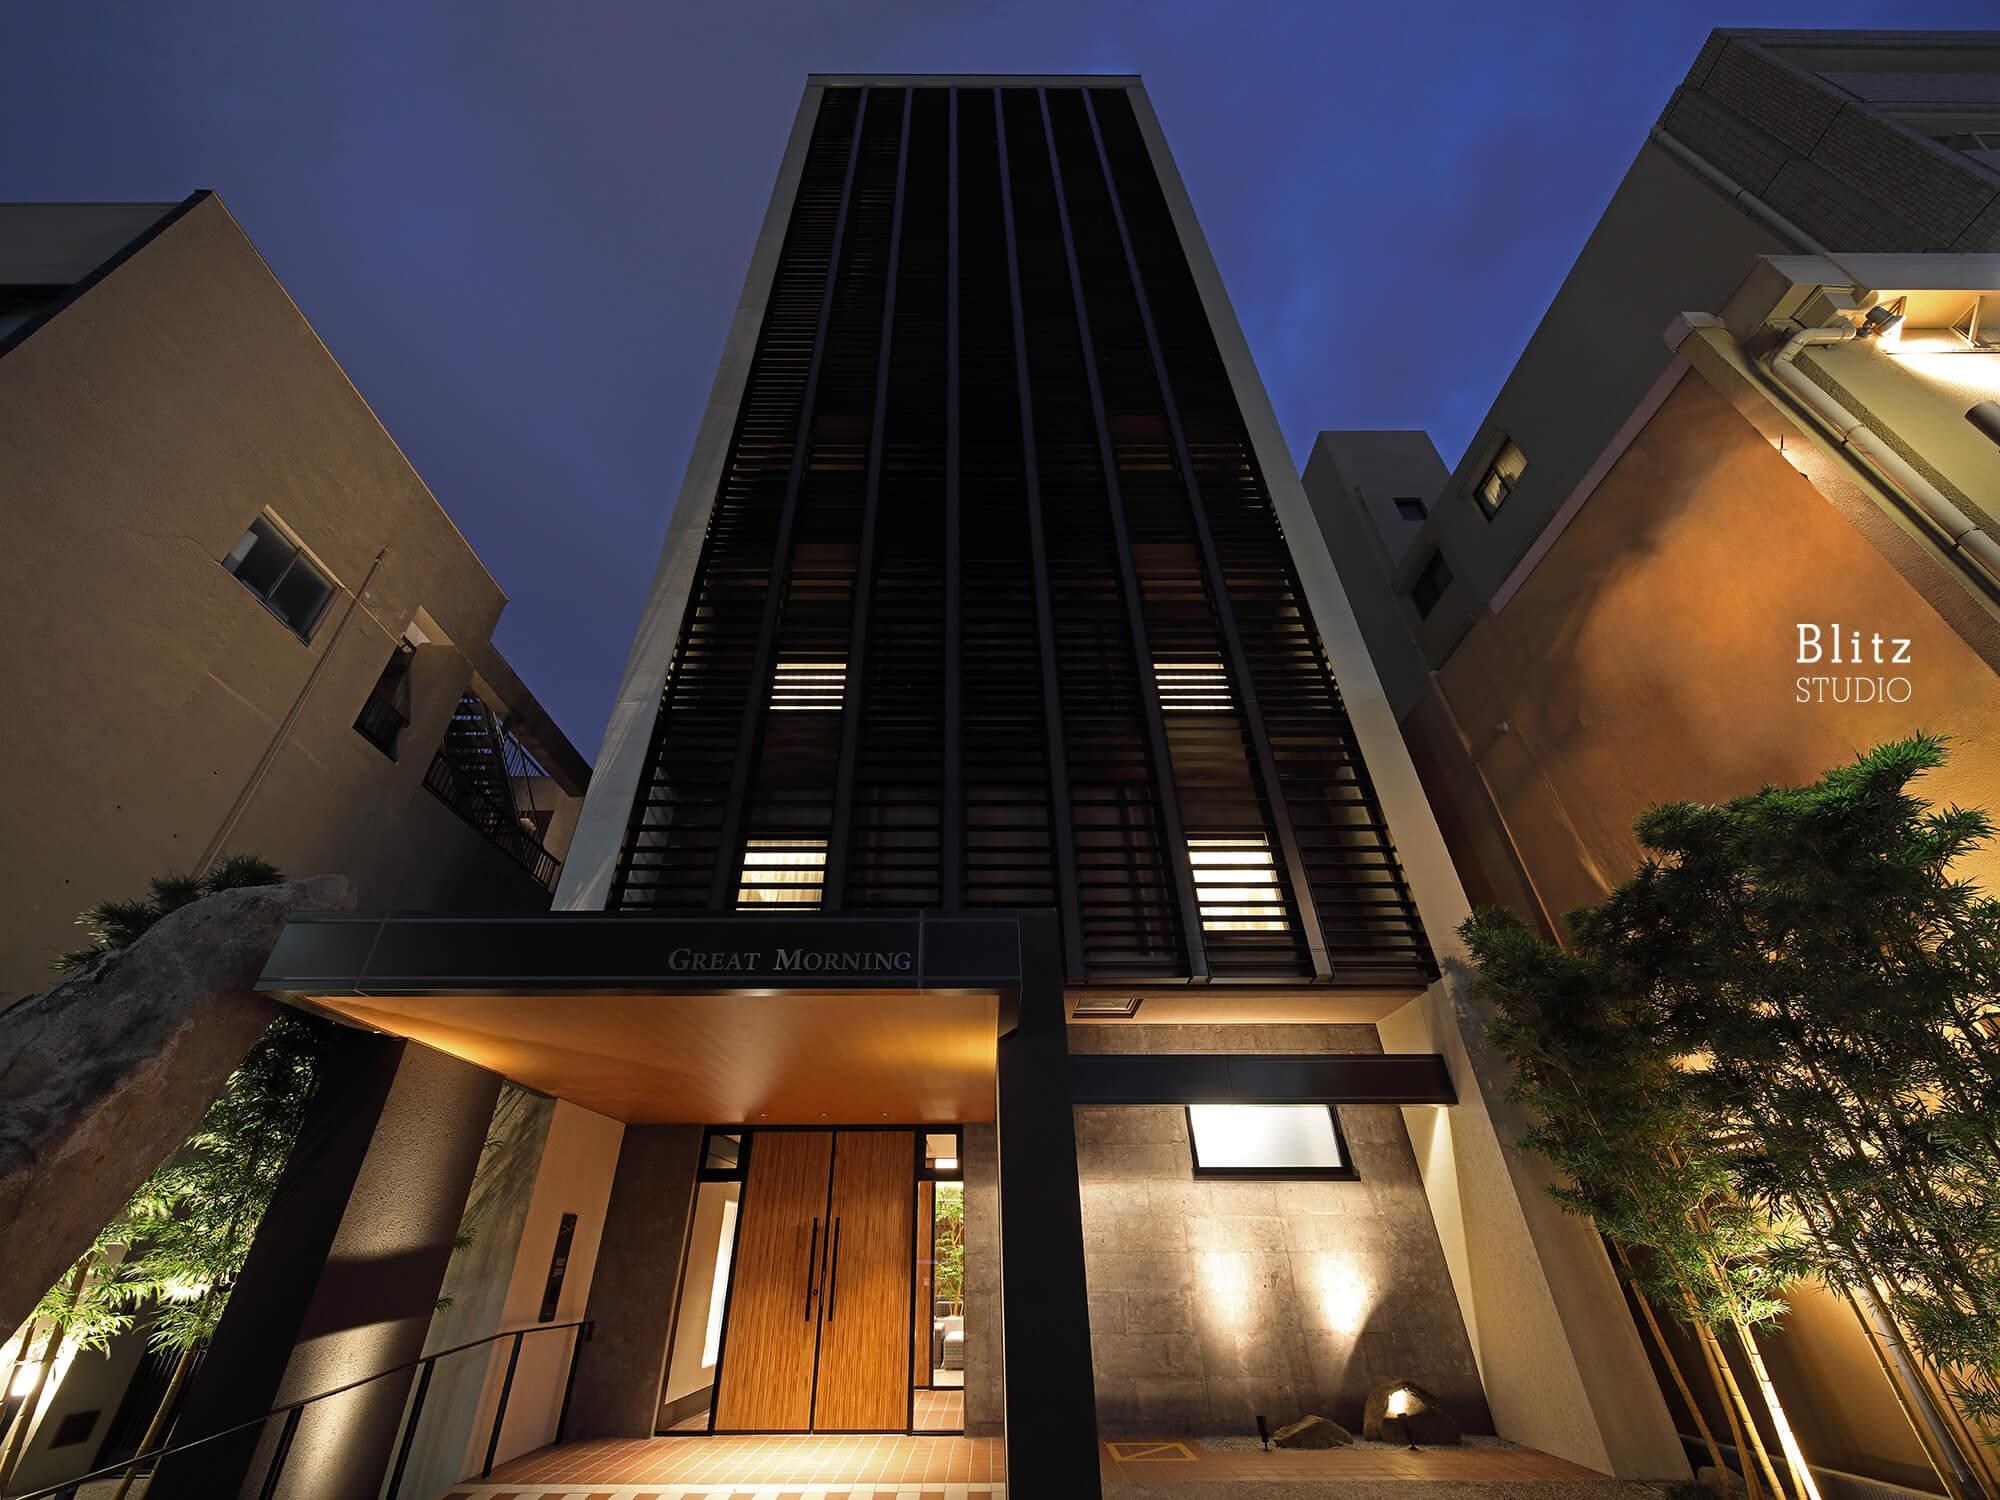 『HOTEL GREAT MORNING』-福岡県福岡市-建築写真・竣工写真・インテリア写真4